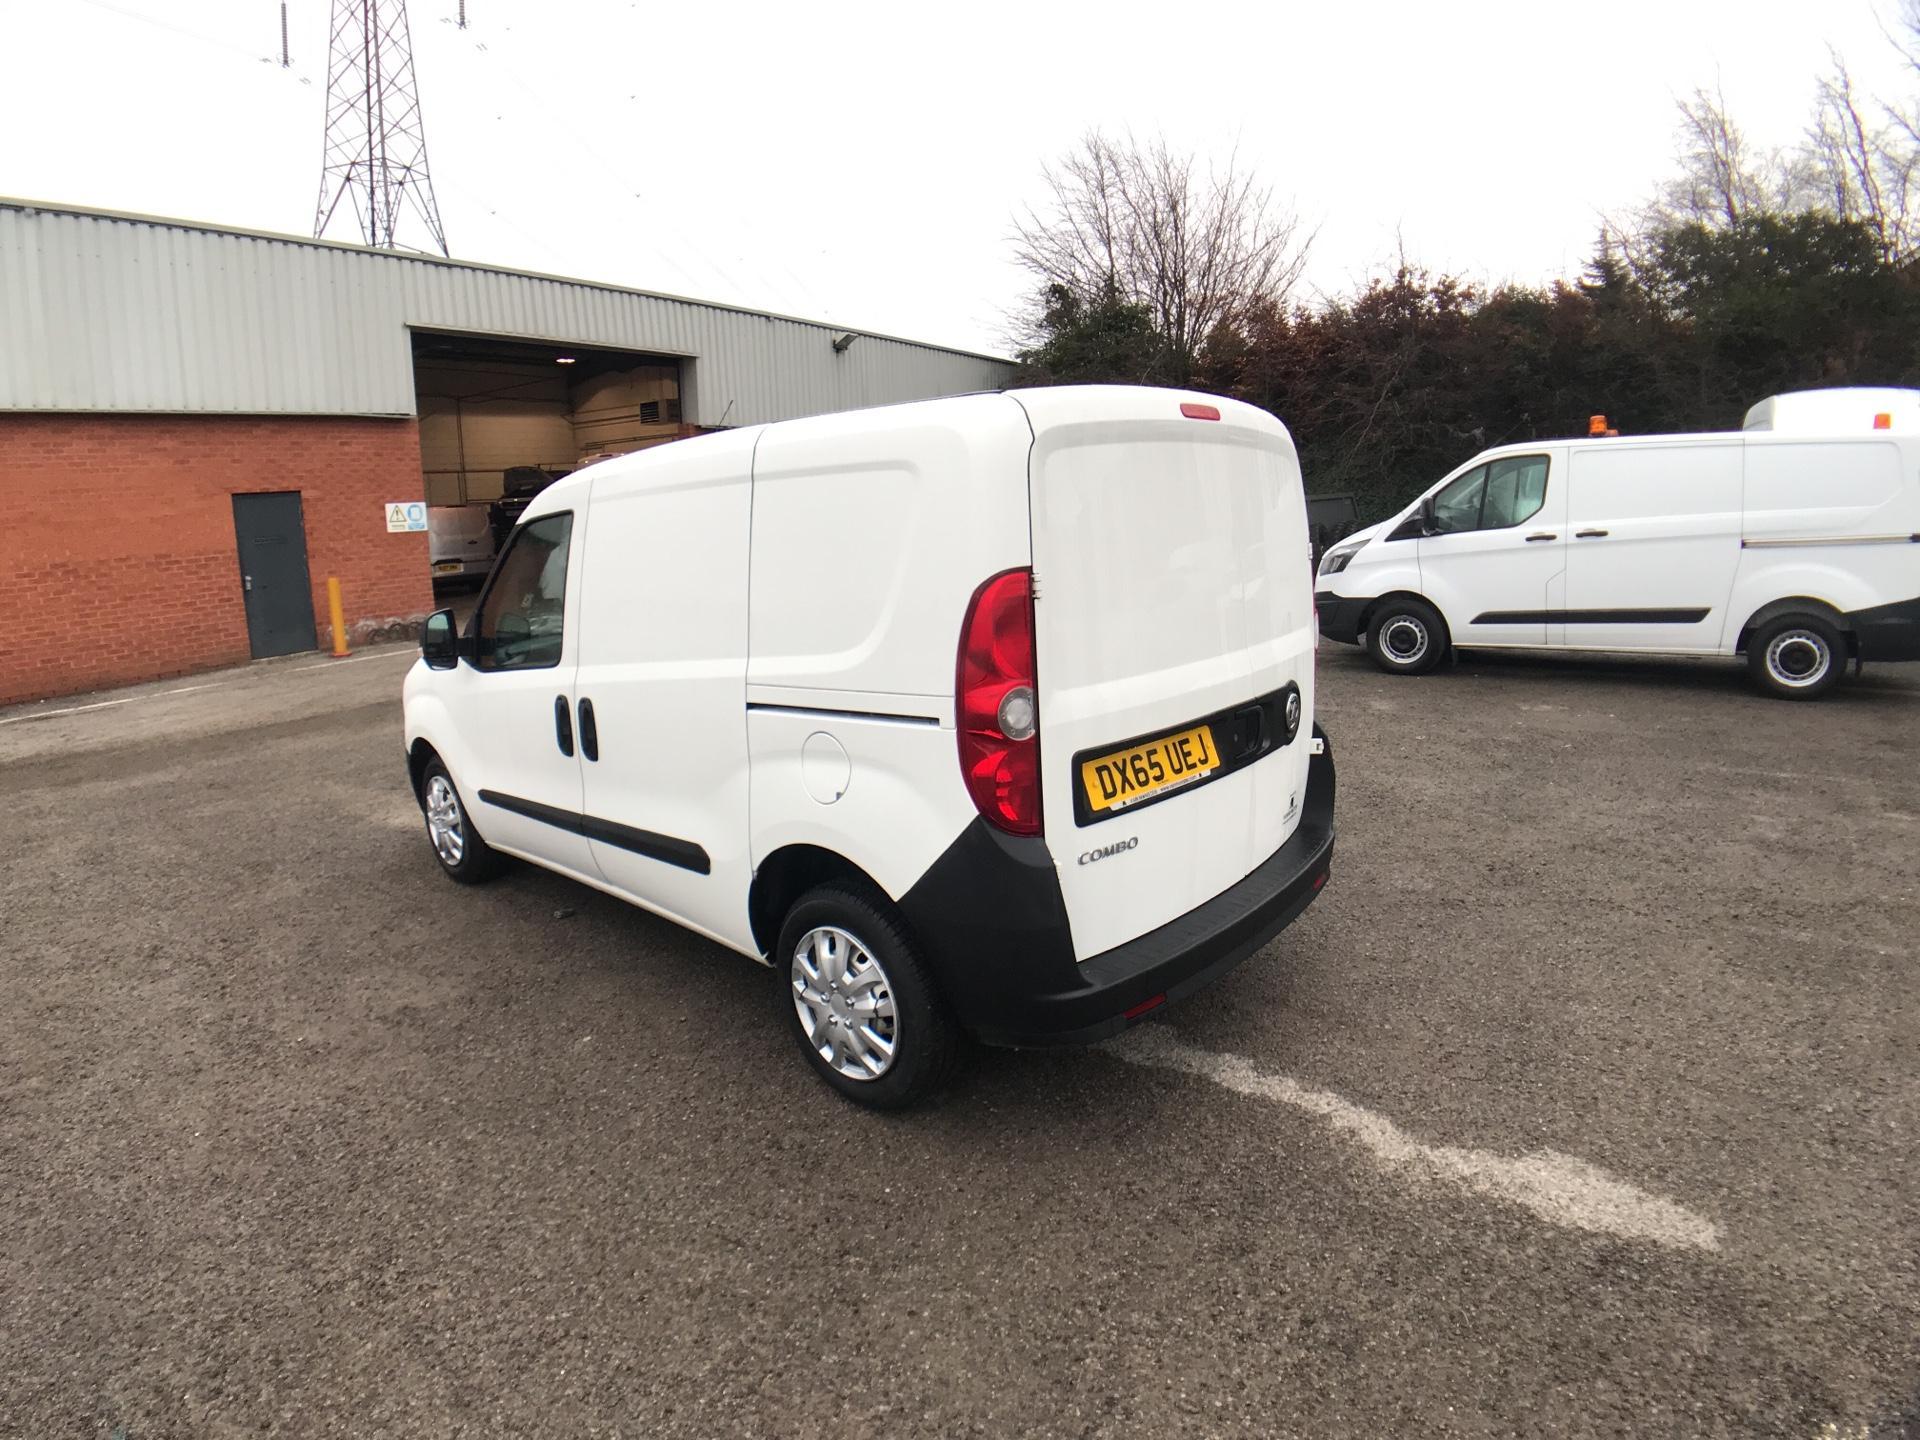 2015 Vauxhall Combo L1 H1 2000 1.3 16V  EURO 5 (DX65UEJ) Image 5